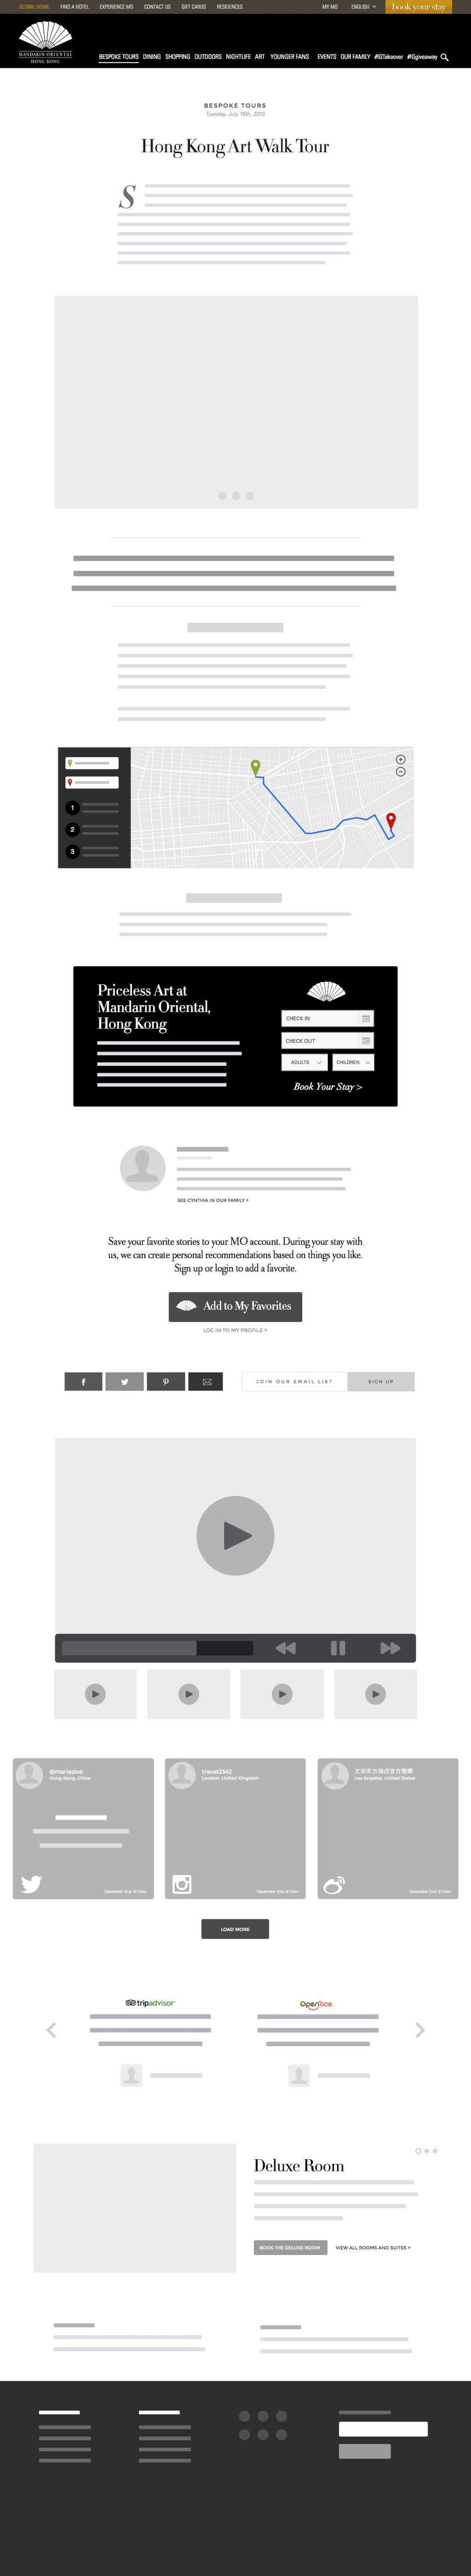 Original Wireframes1_Page_04.jpg